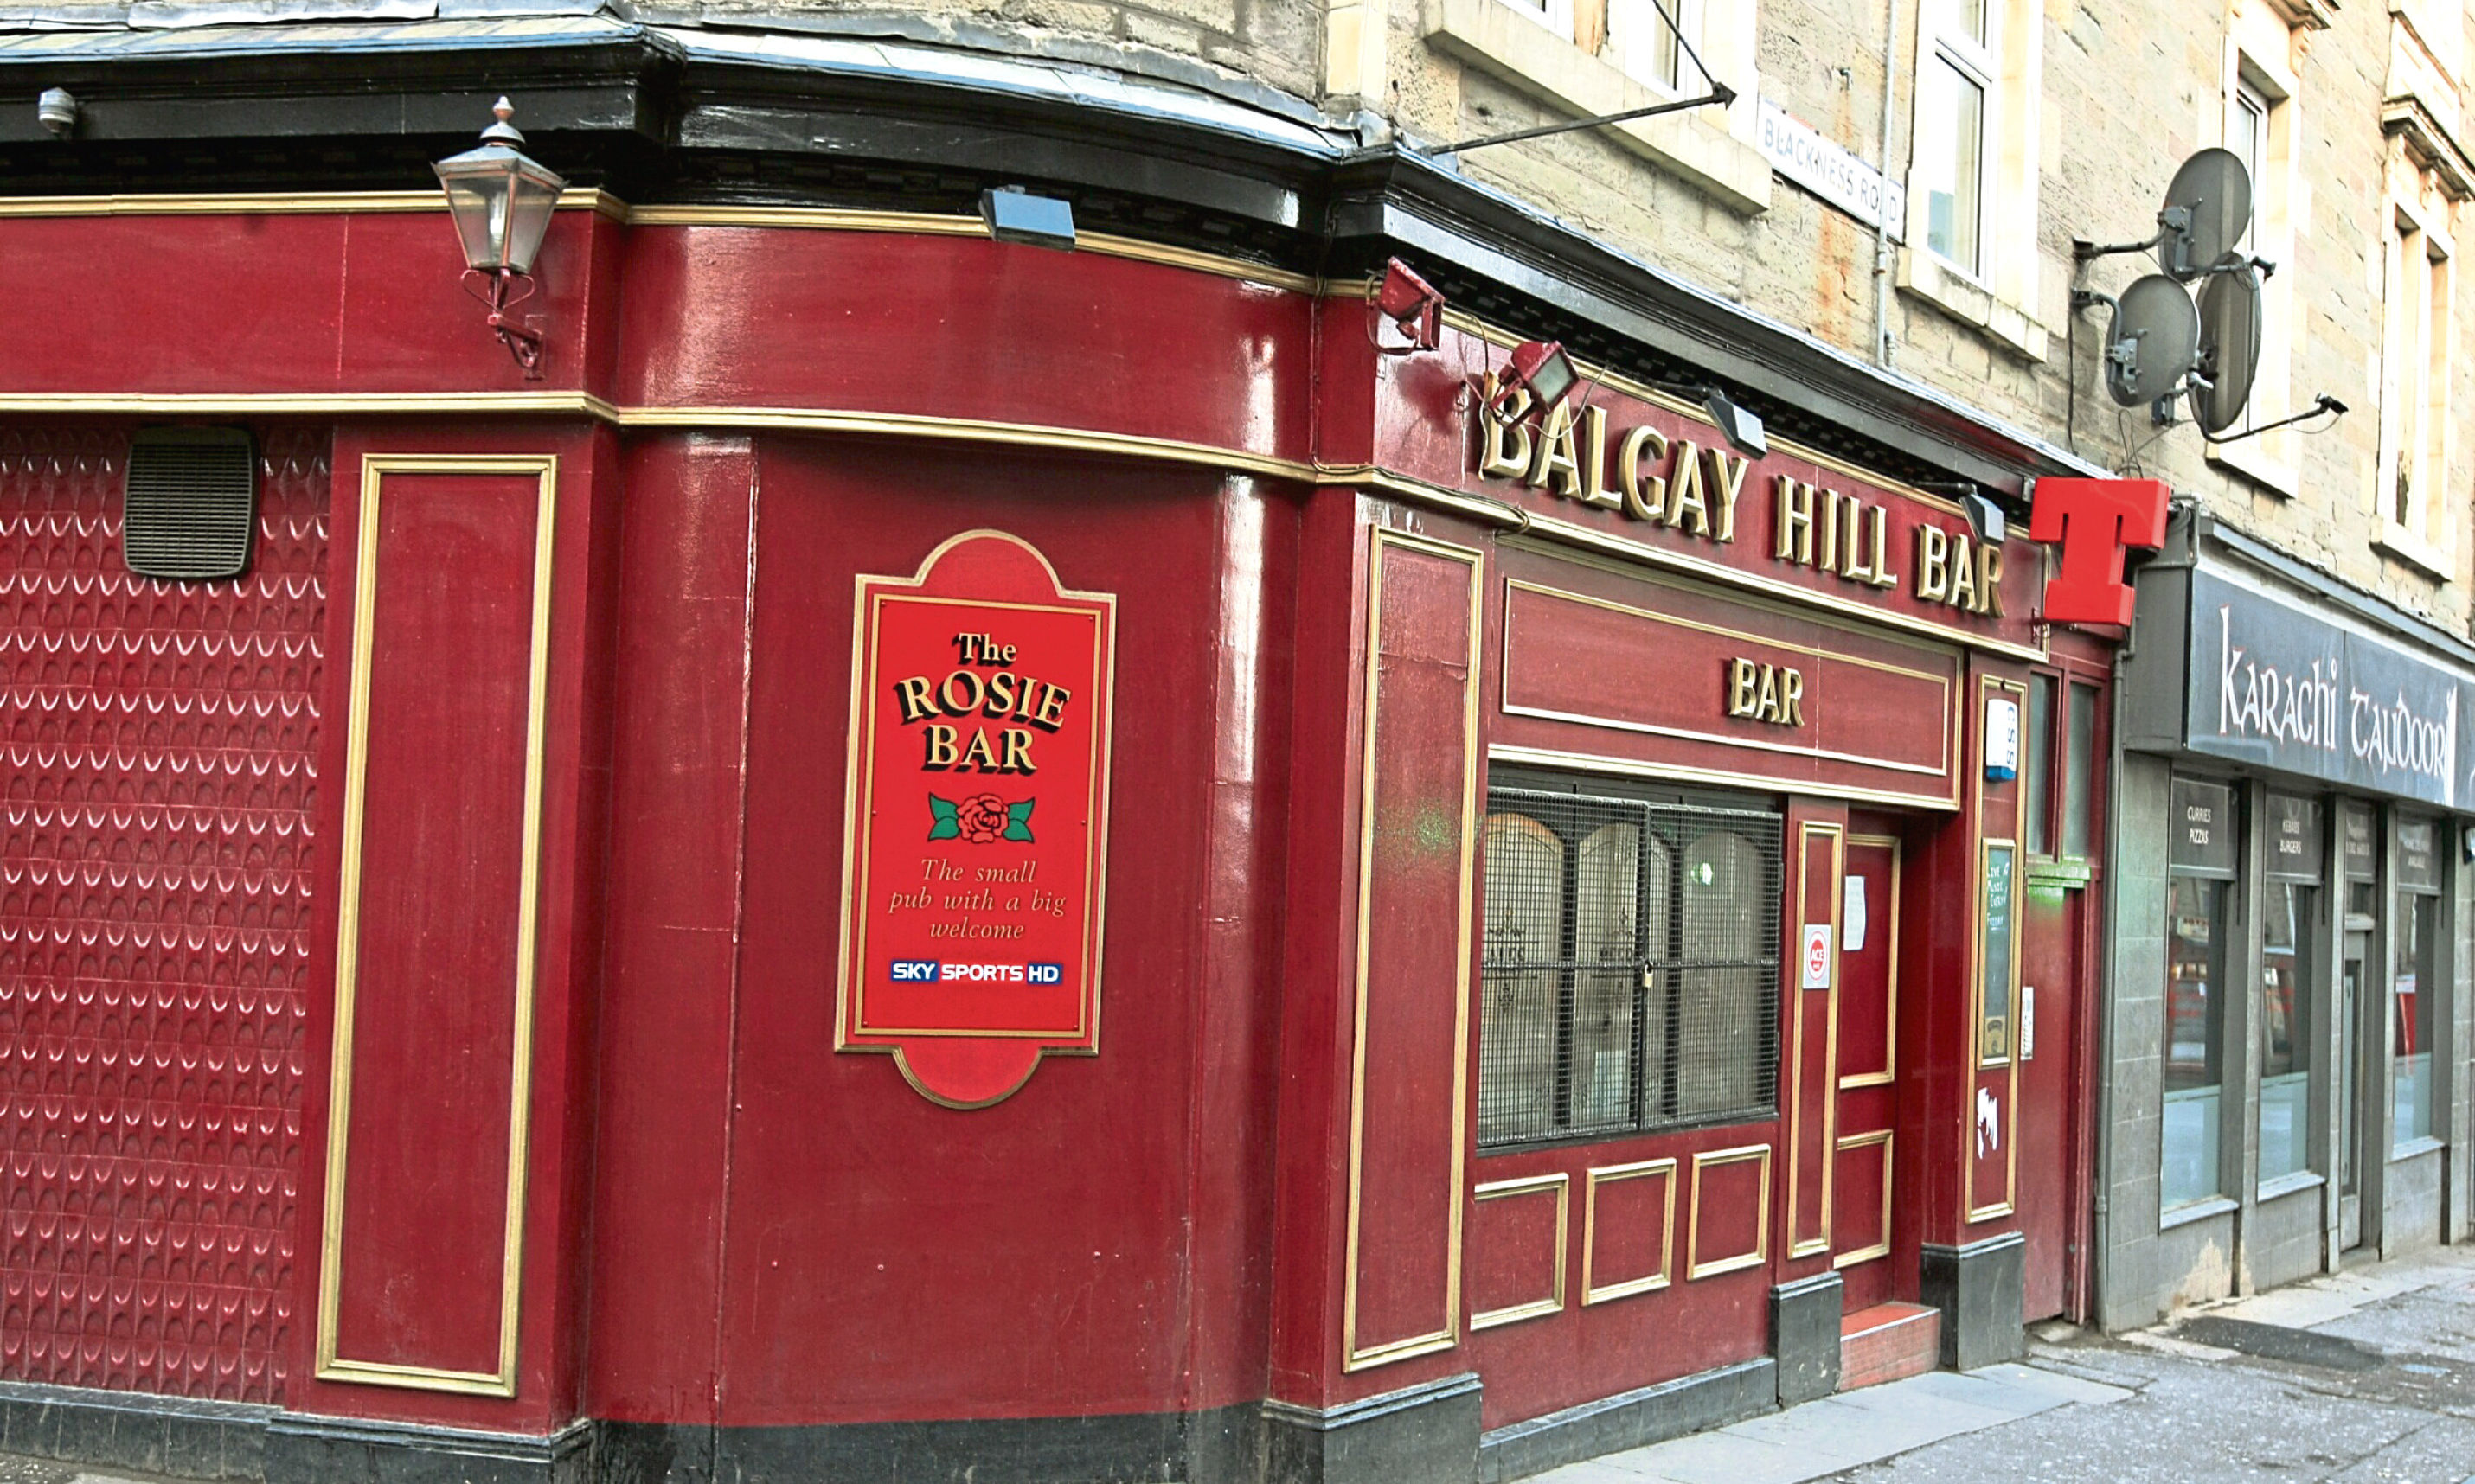 The Balgay Hill Bar.